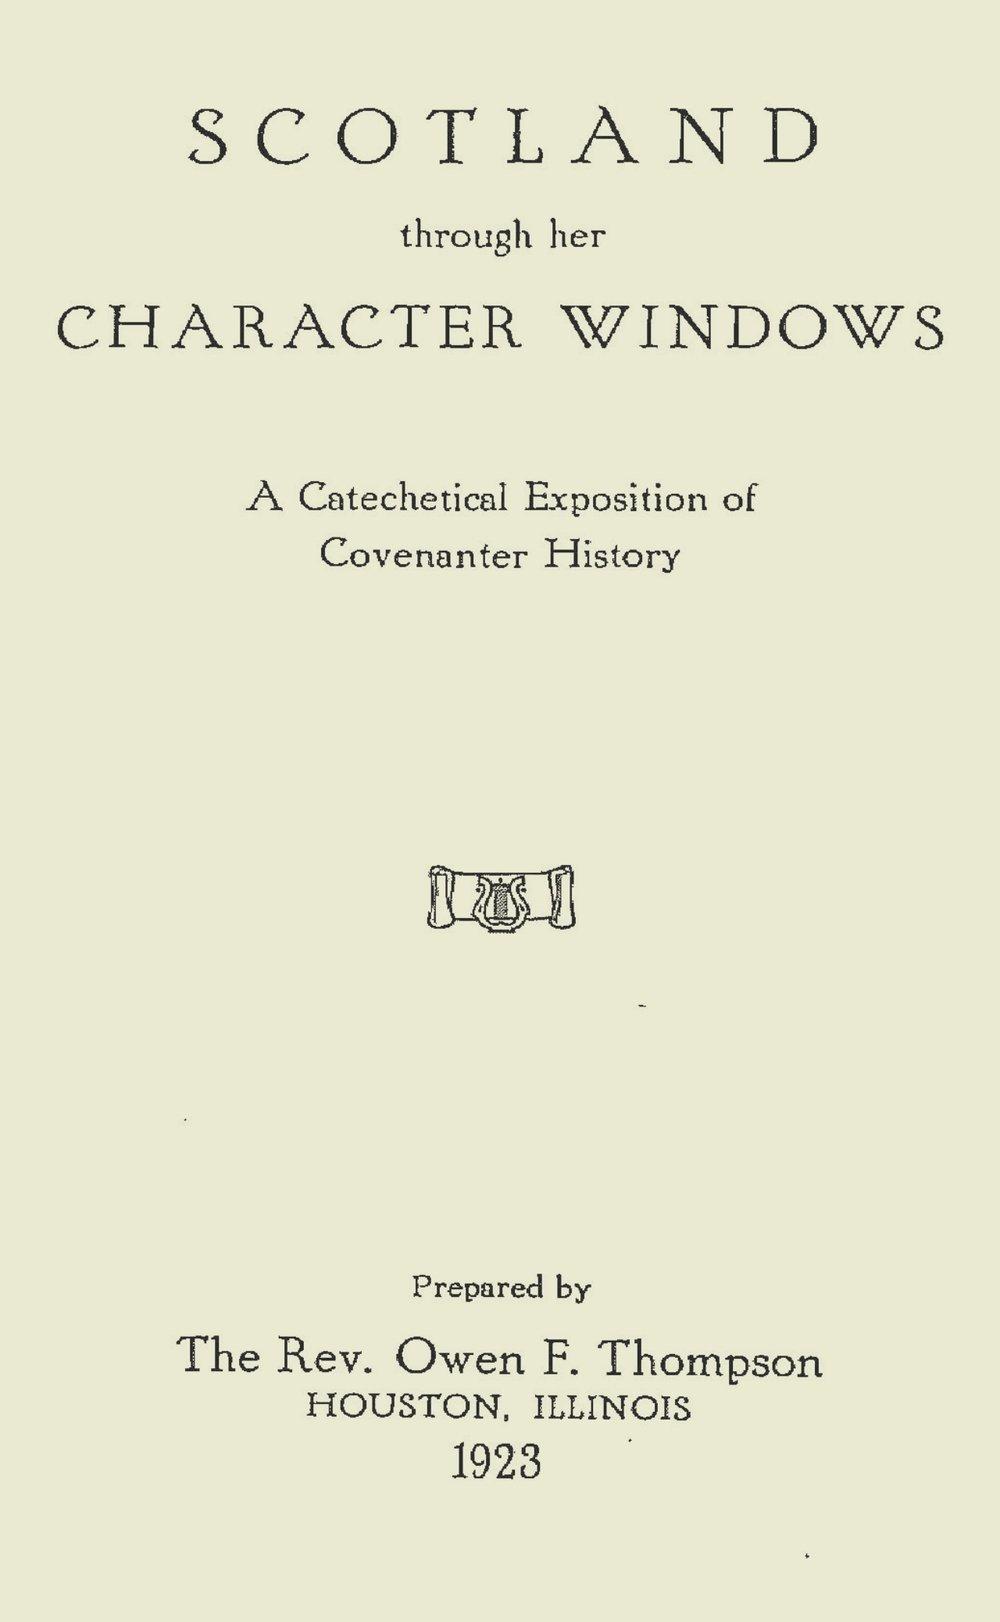 Thompson, Owen Foster, Scotland Through Her Character Windows Title Page.jpg